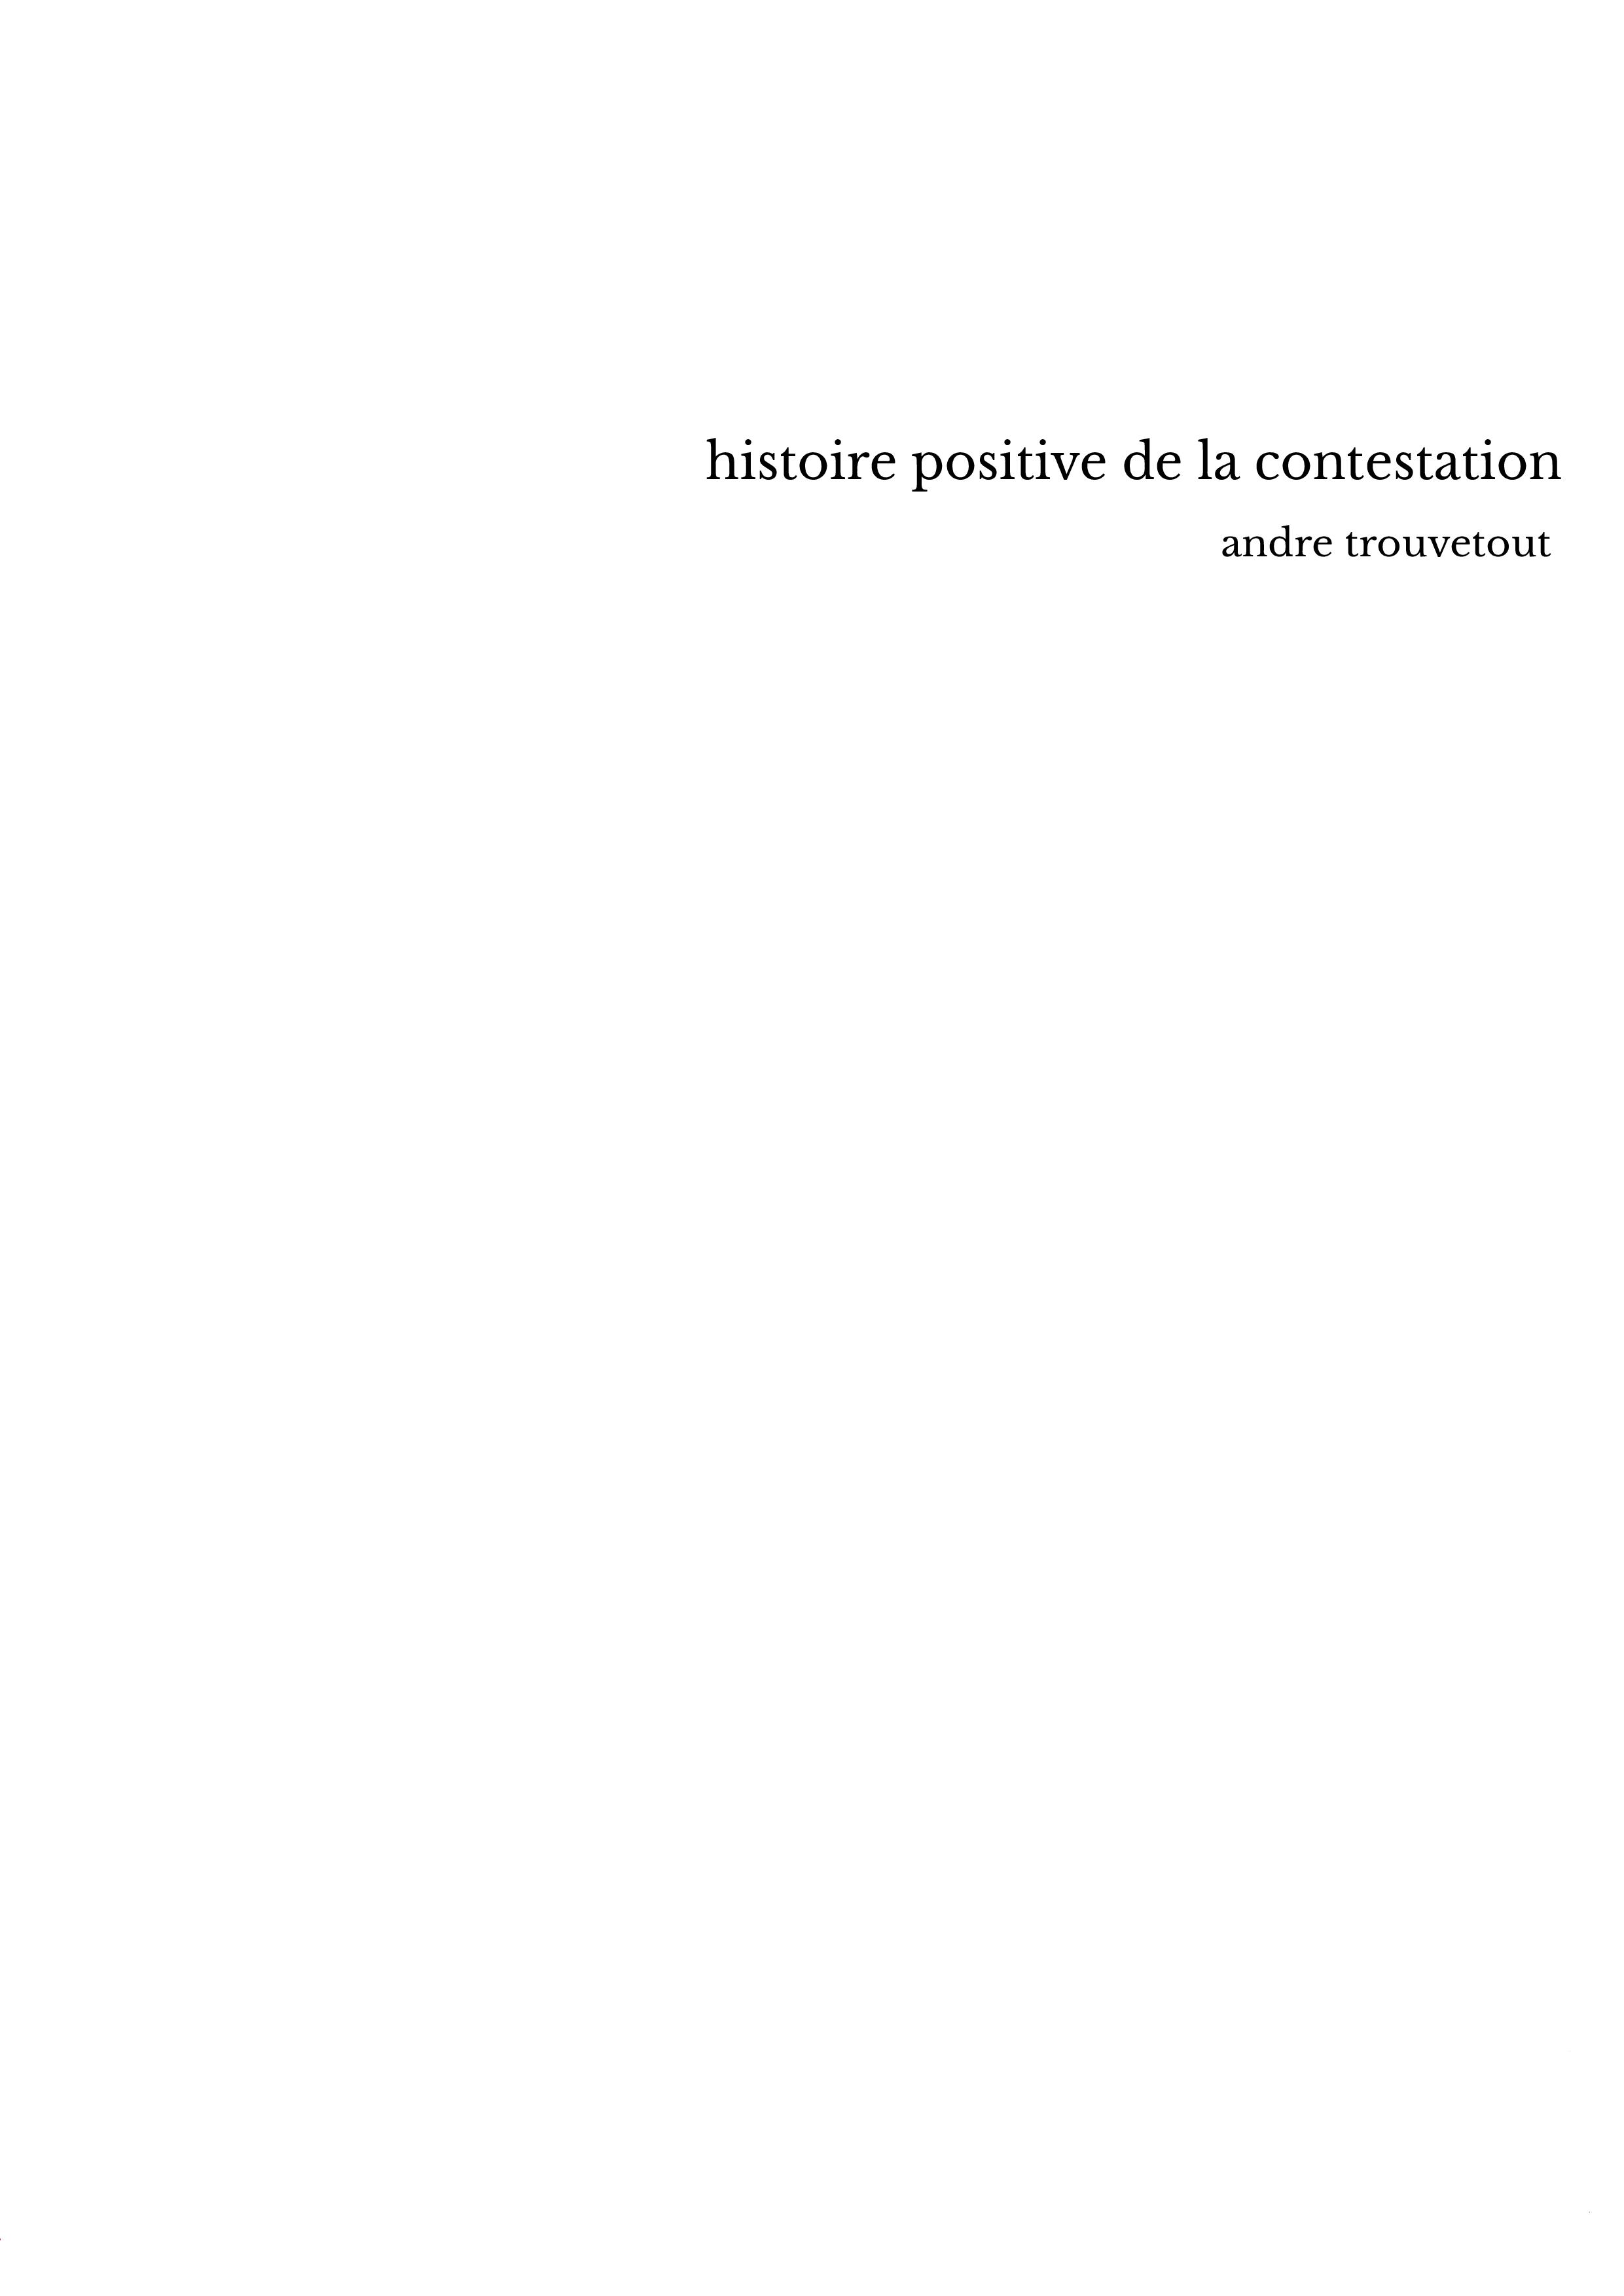 histoire positive de la contestation